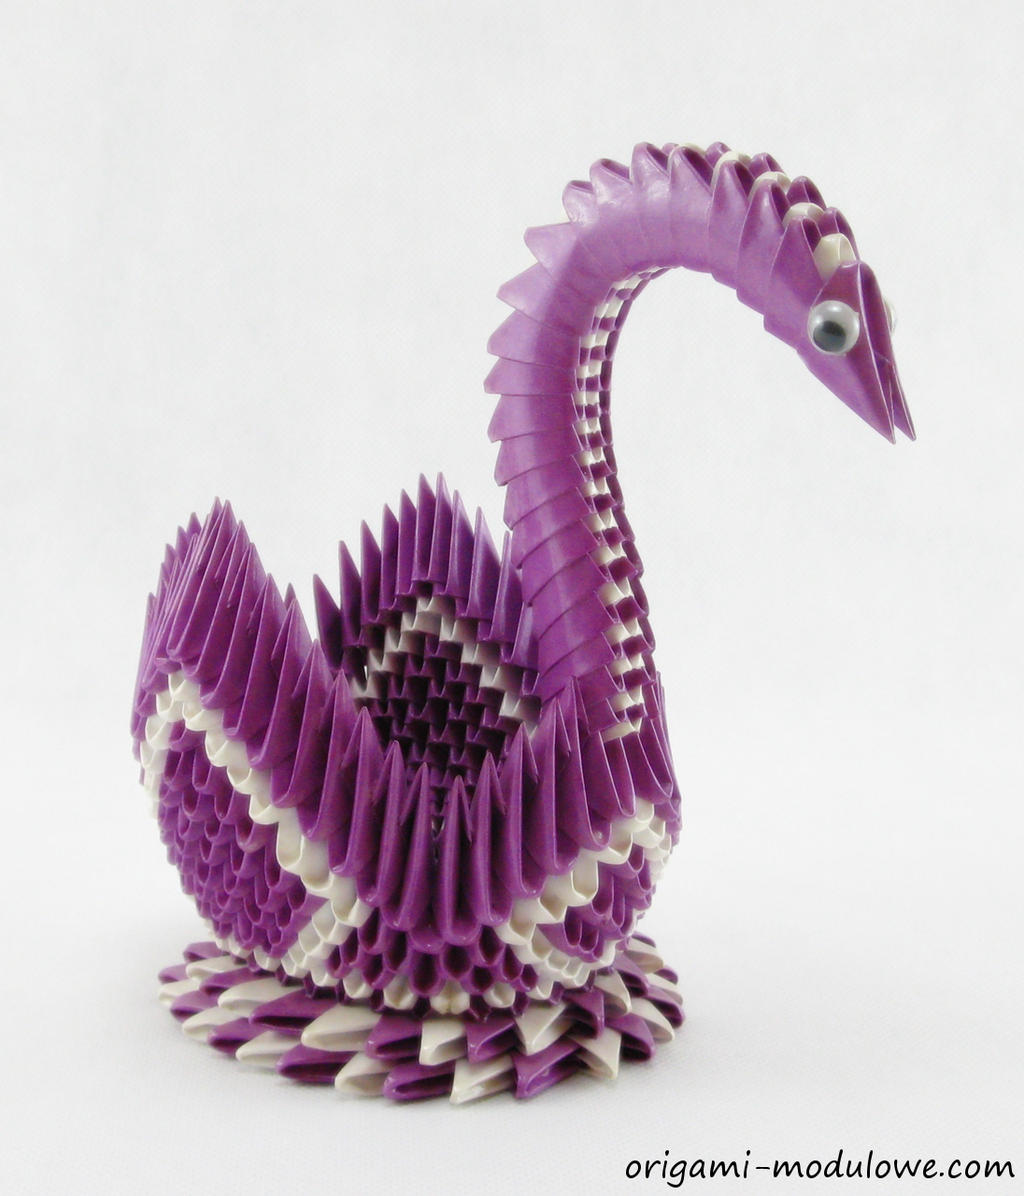 3d origami peacock 2 | Origami techniques, Modular origami, 3d origami | 1196x1024